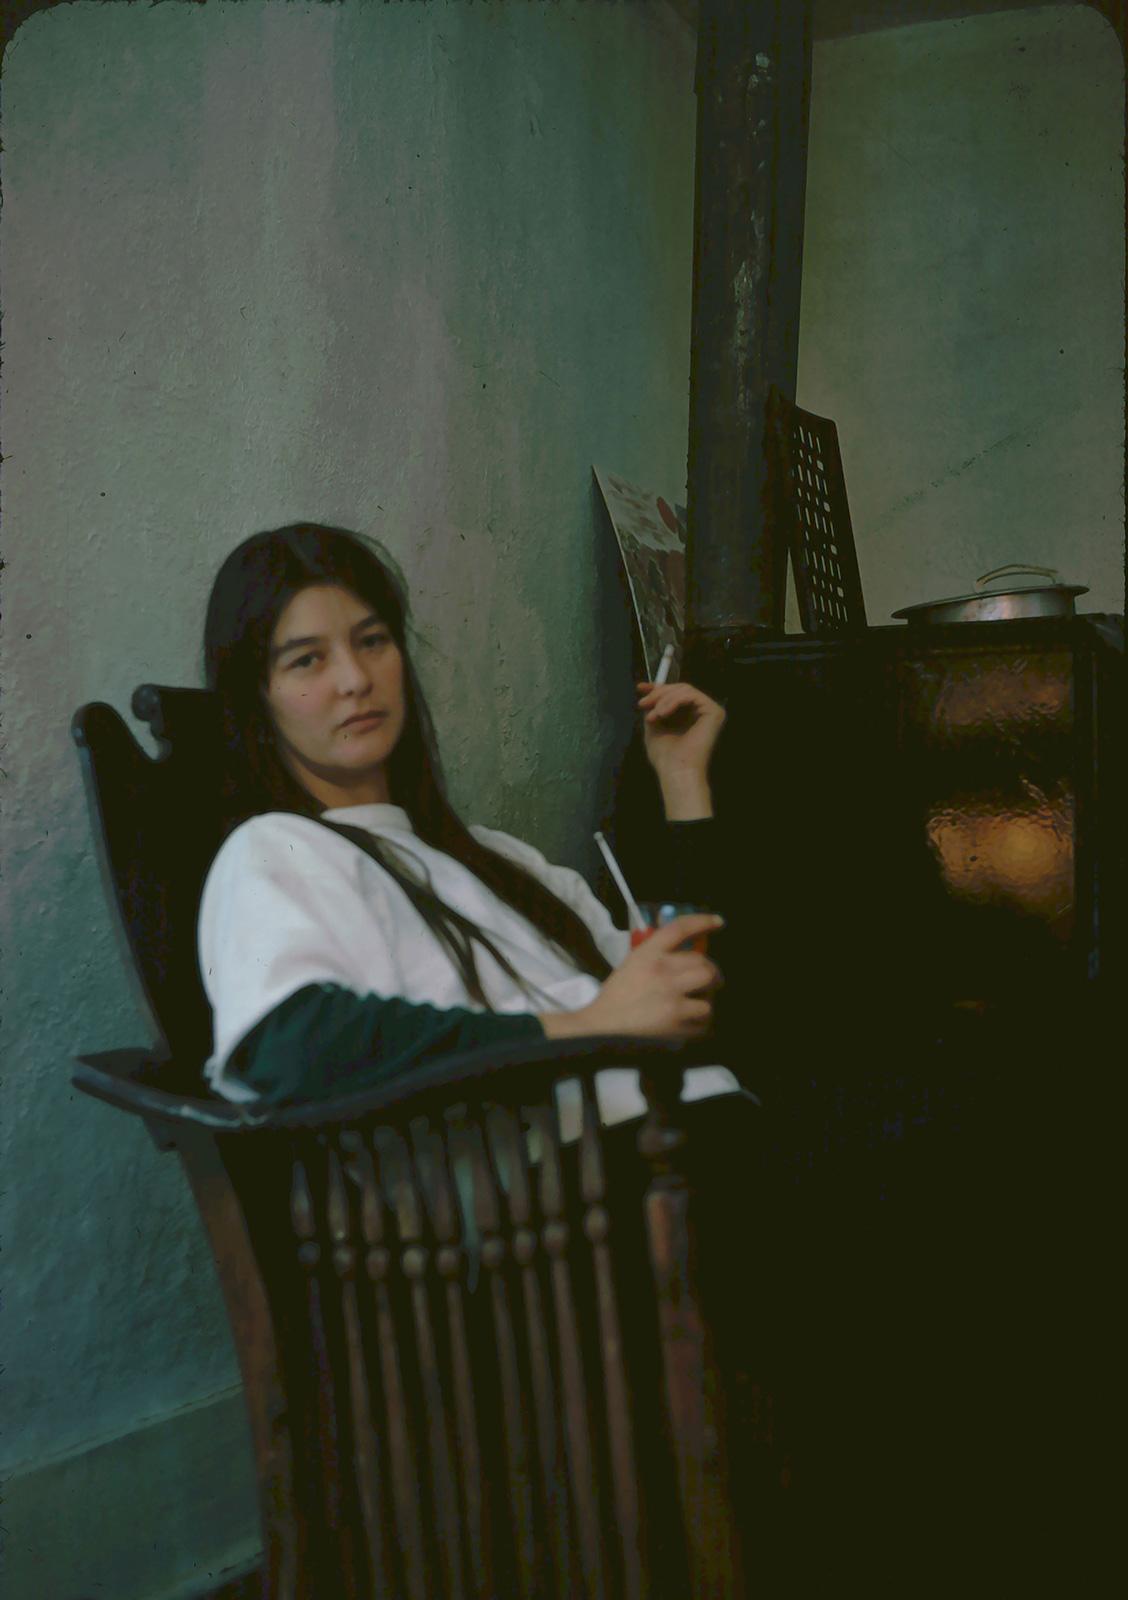 A new documentary portraits forgotten folk legend Karen Dalton